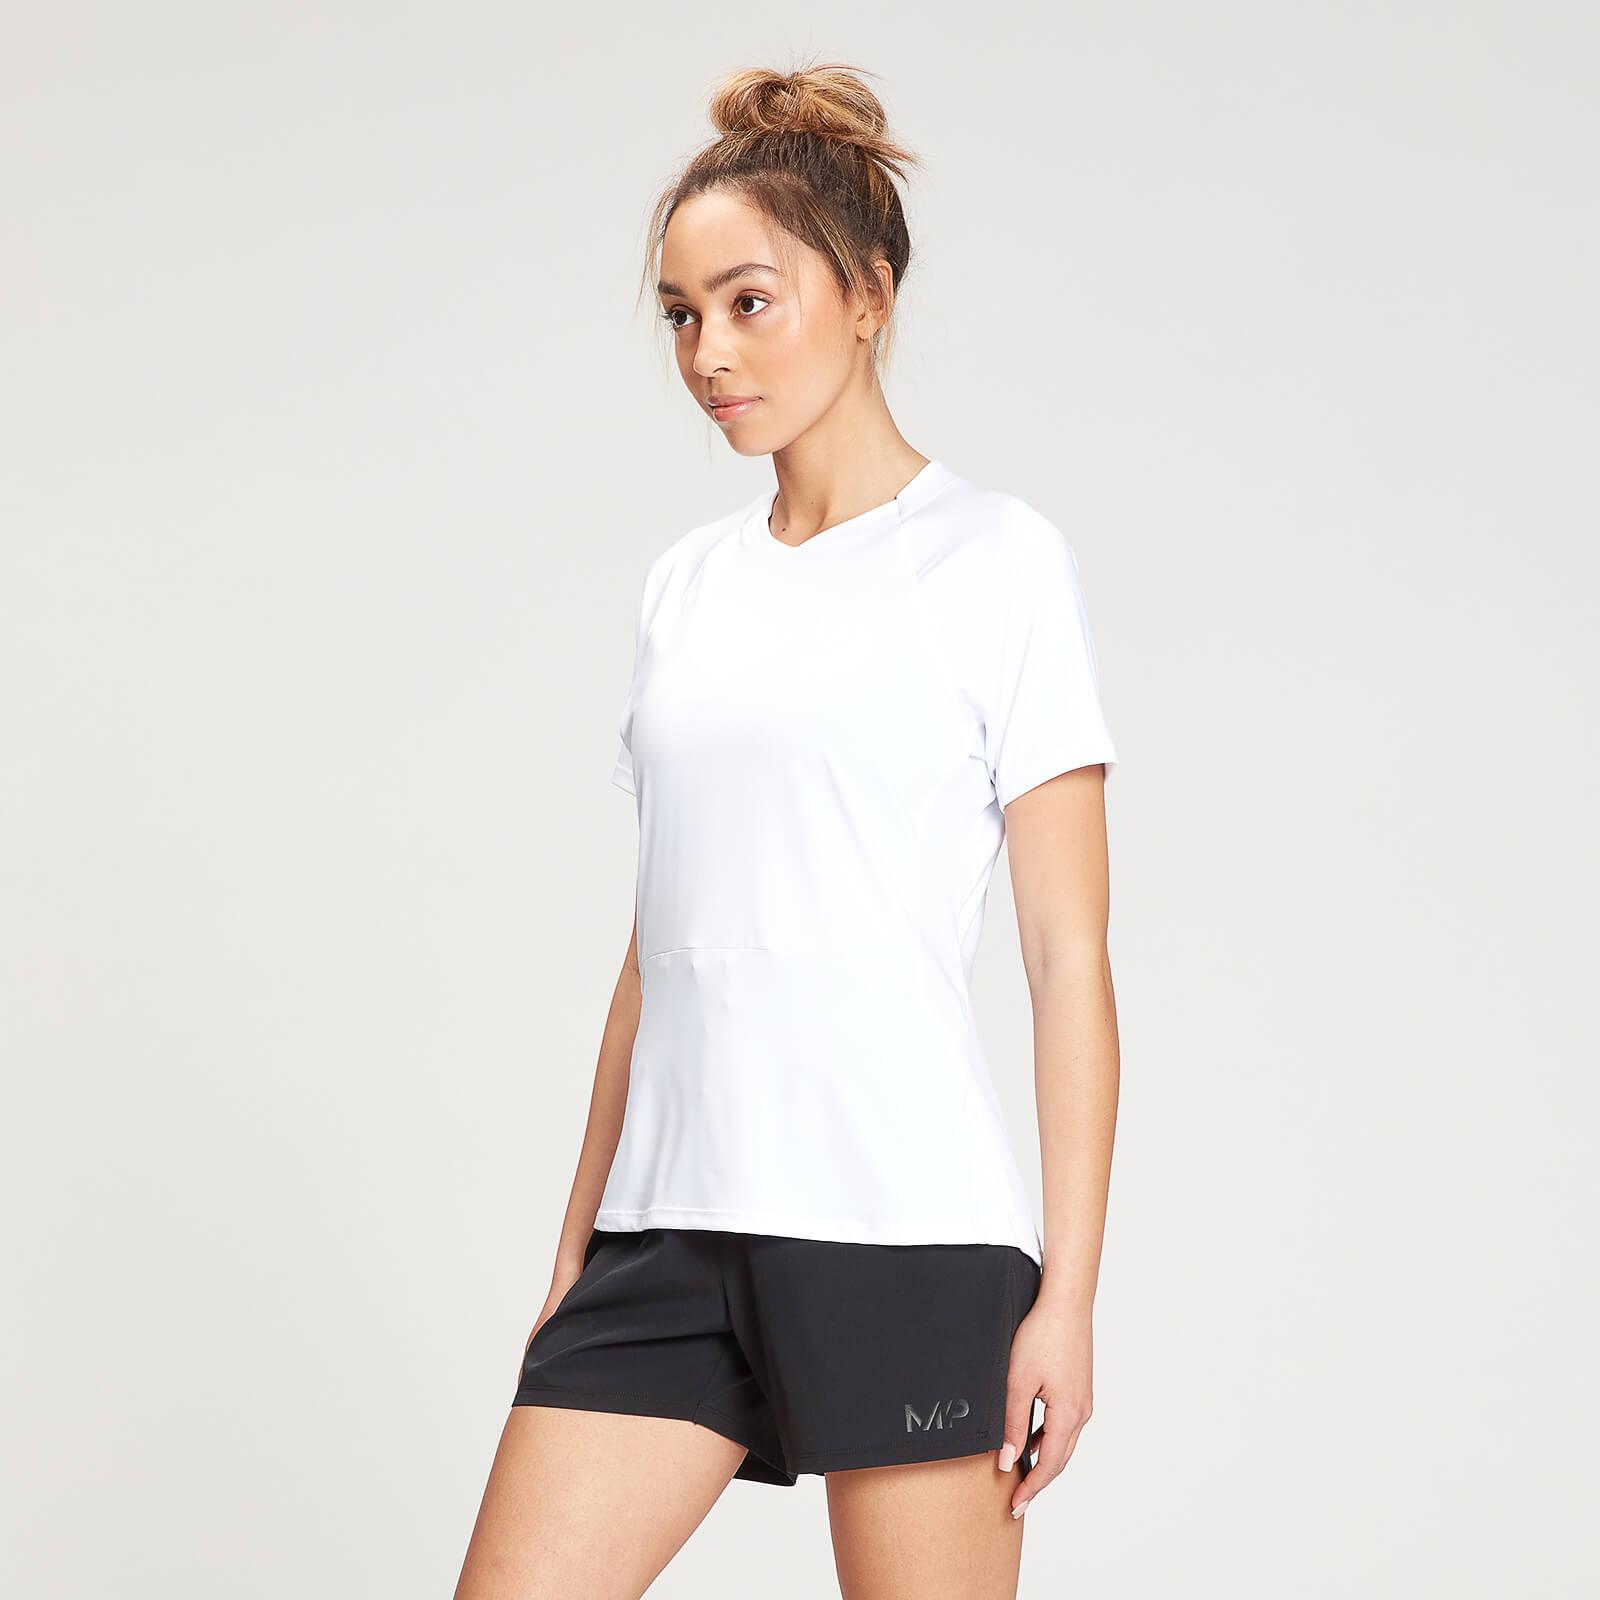 Купить MP Women's Agility Short Sleeve Top - White - XXS, Myprotein International